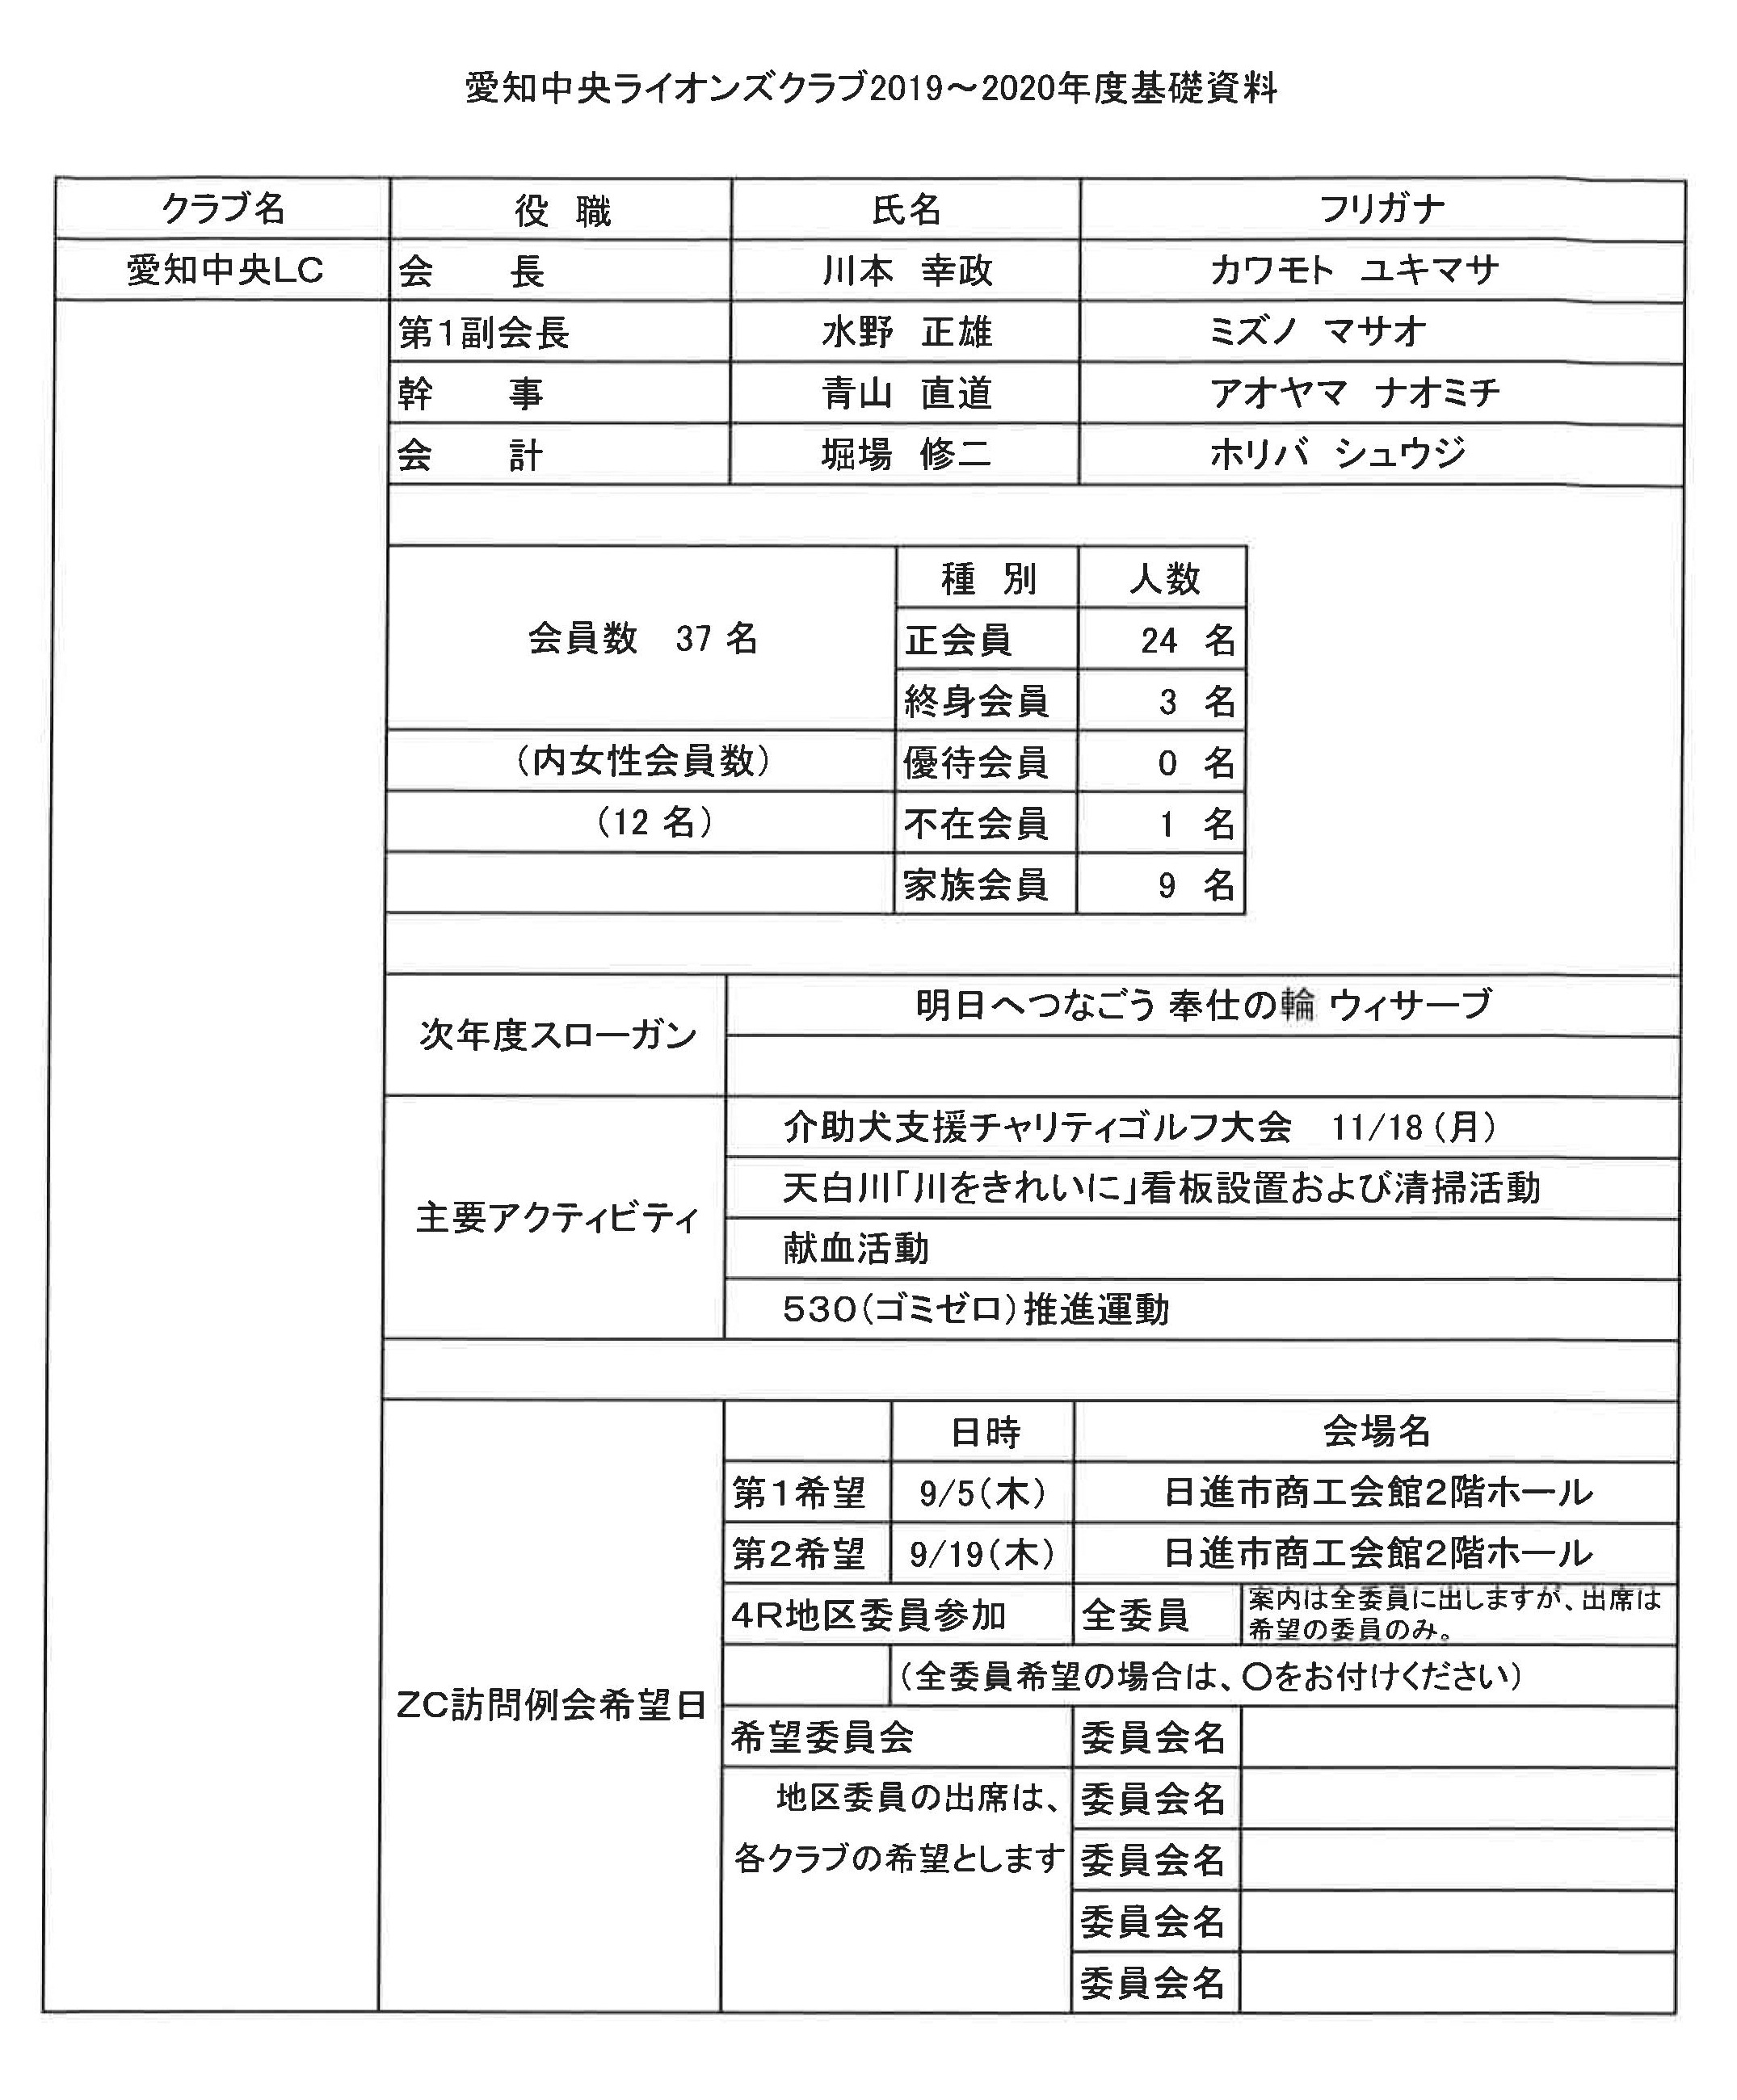 29C準備ゾーン会議 愛知中央LC今年度資料1